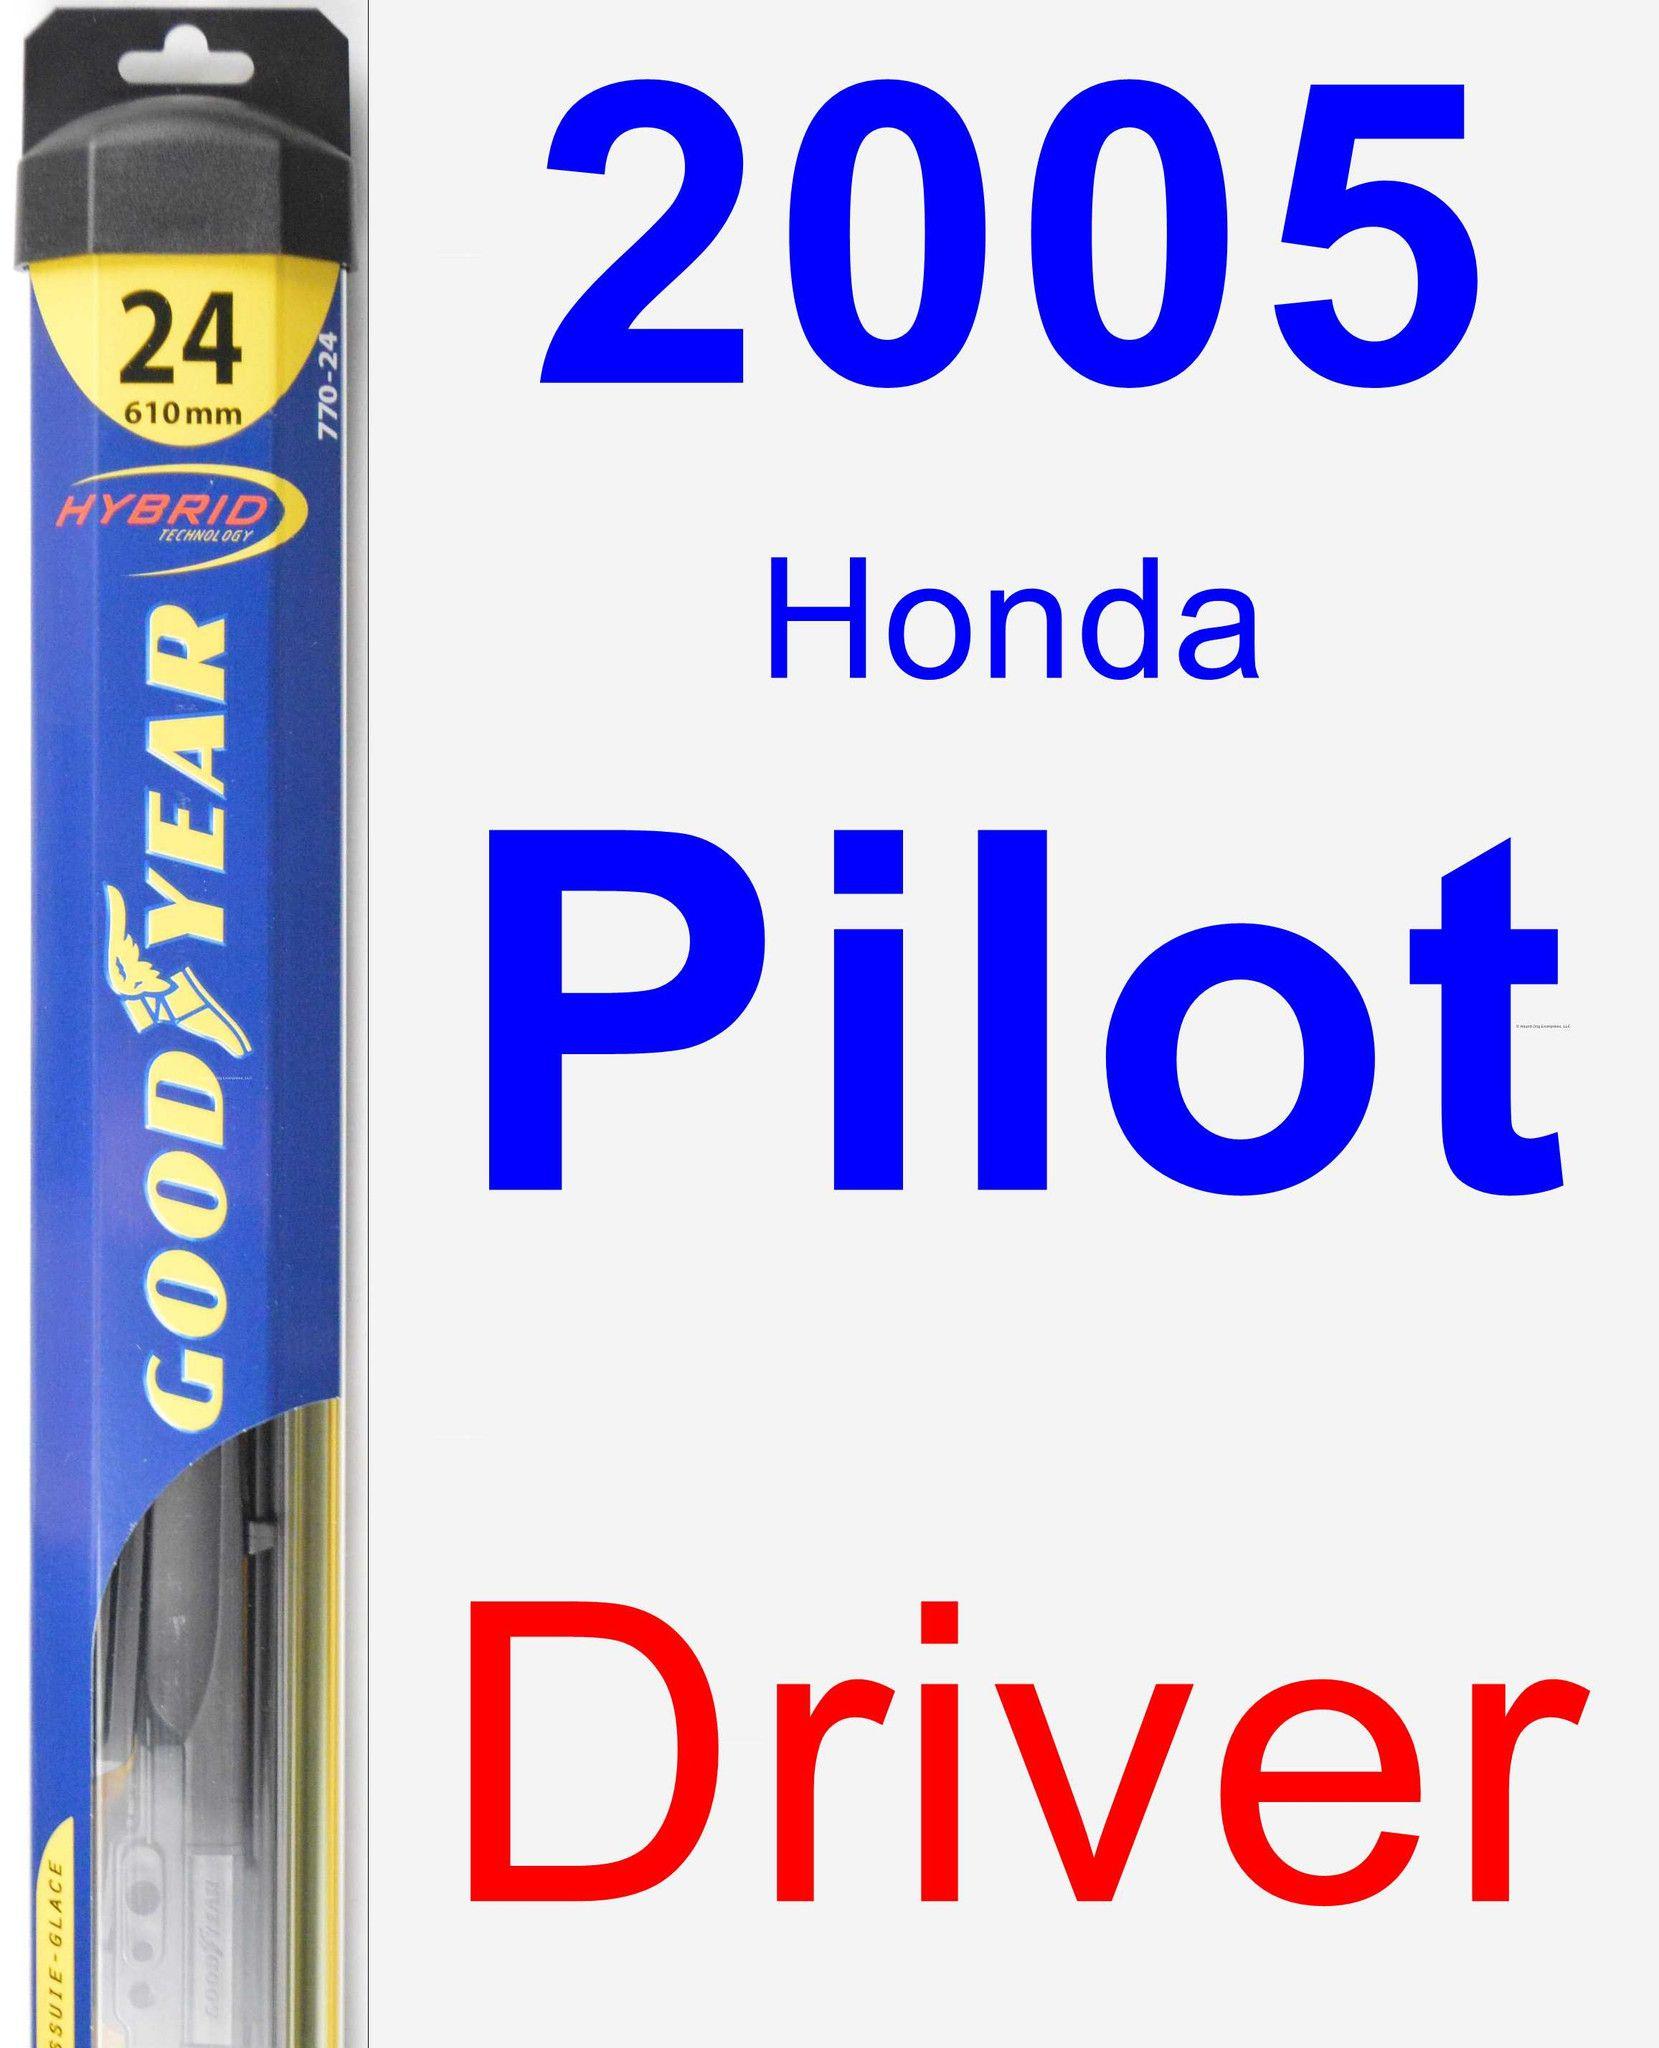 Driver Wiper Blade For 2005 Honda Pilot - Hybrid